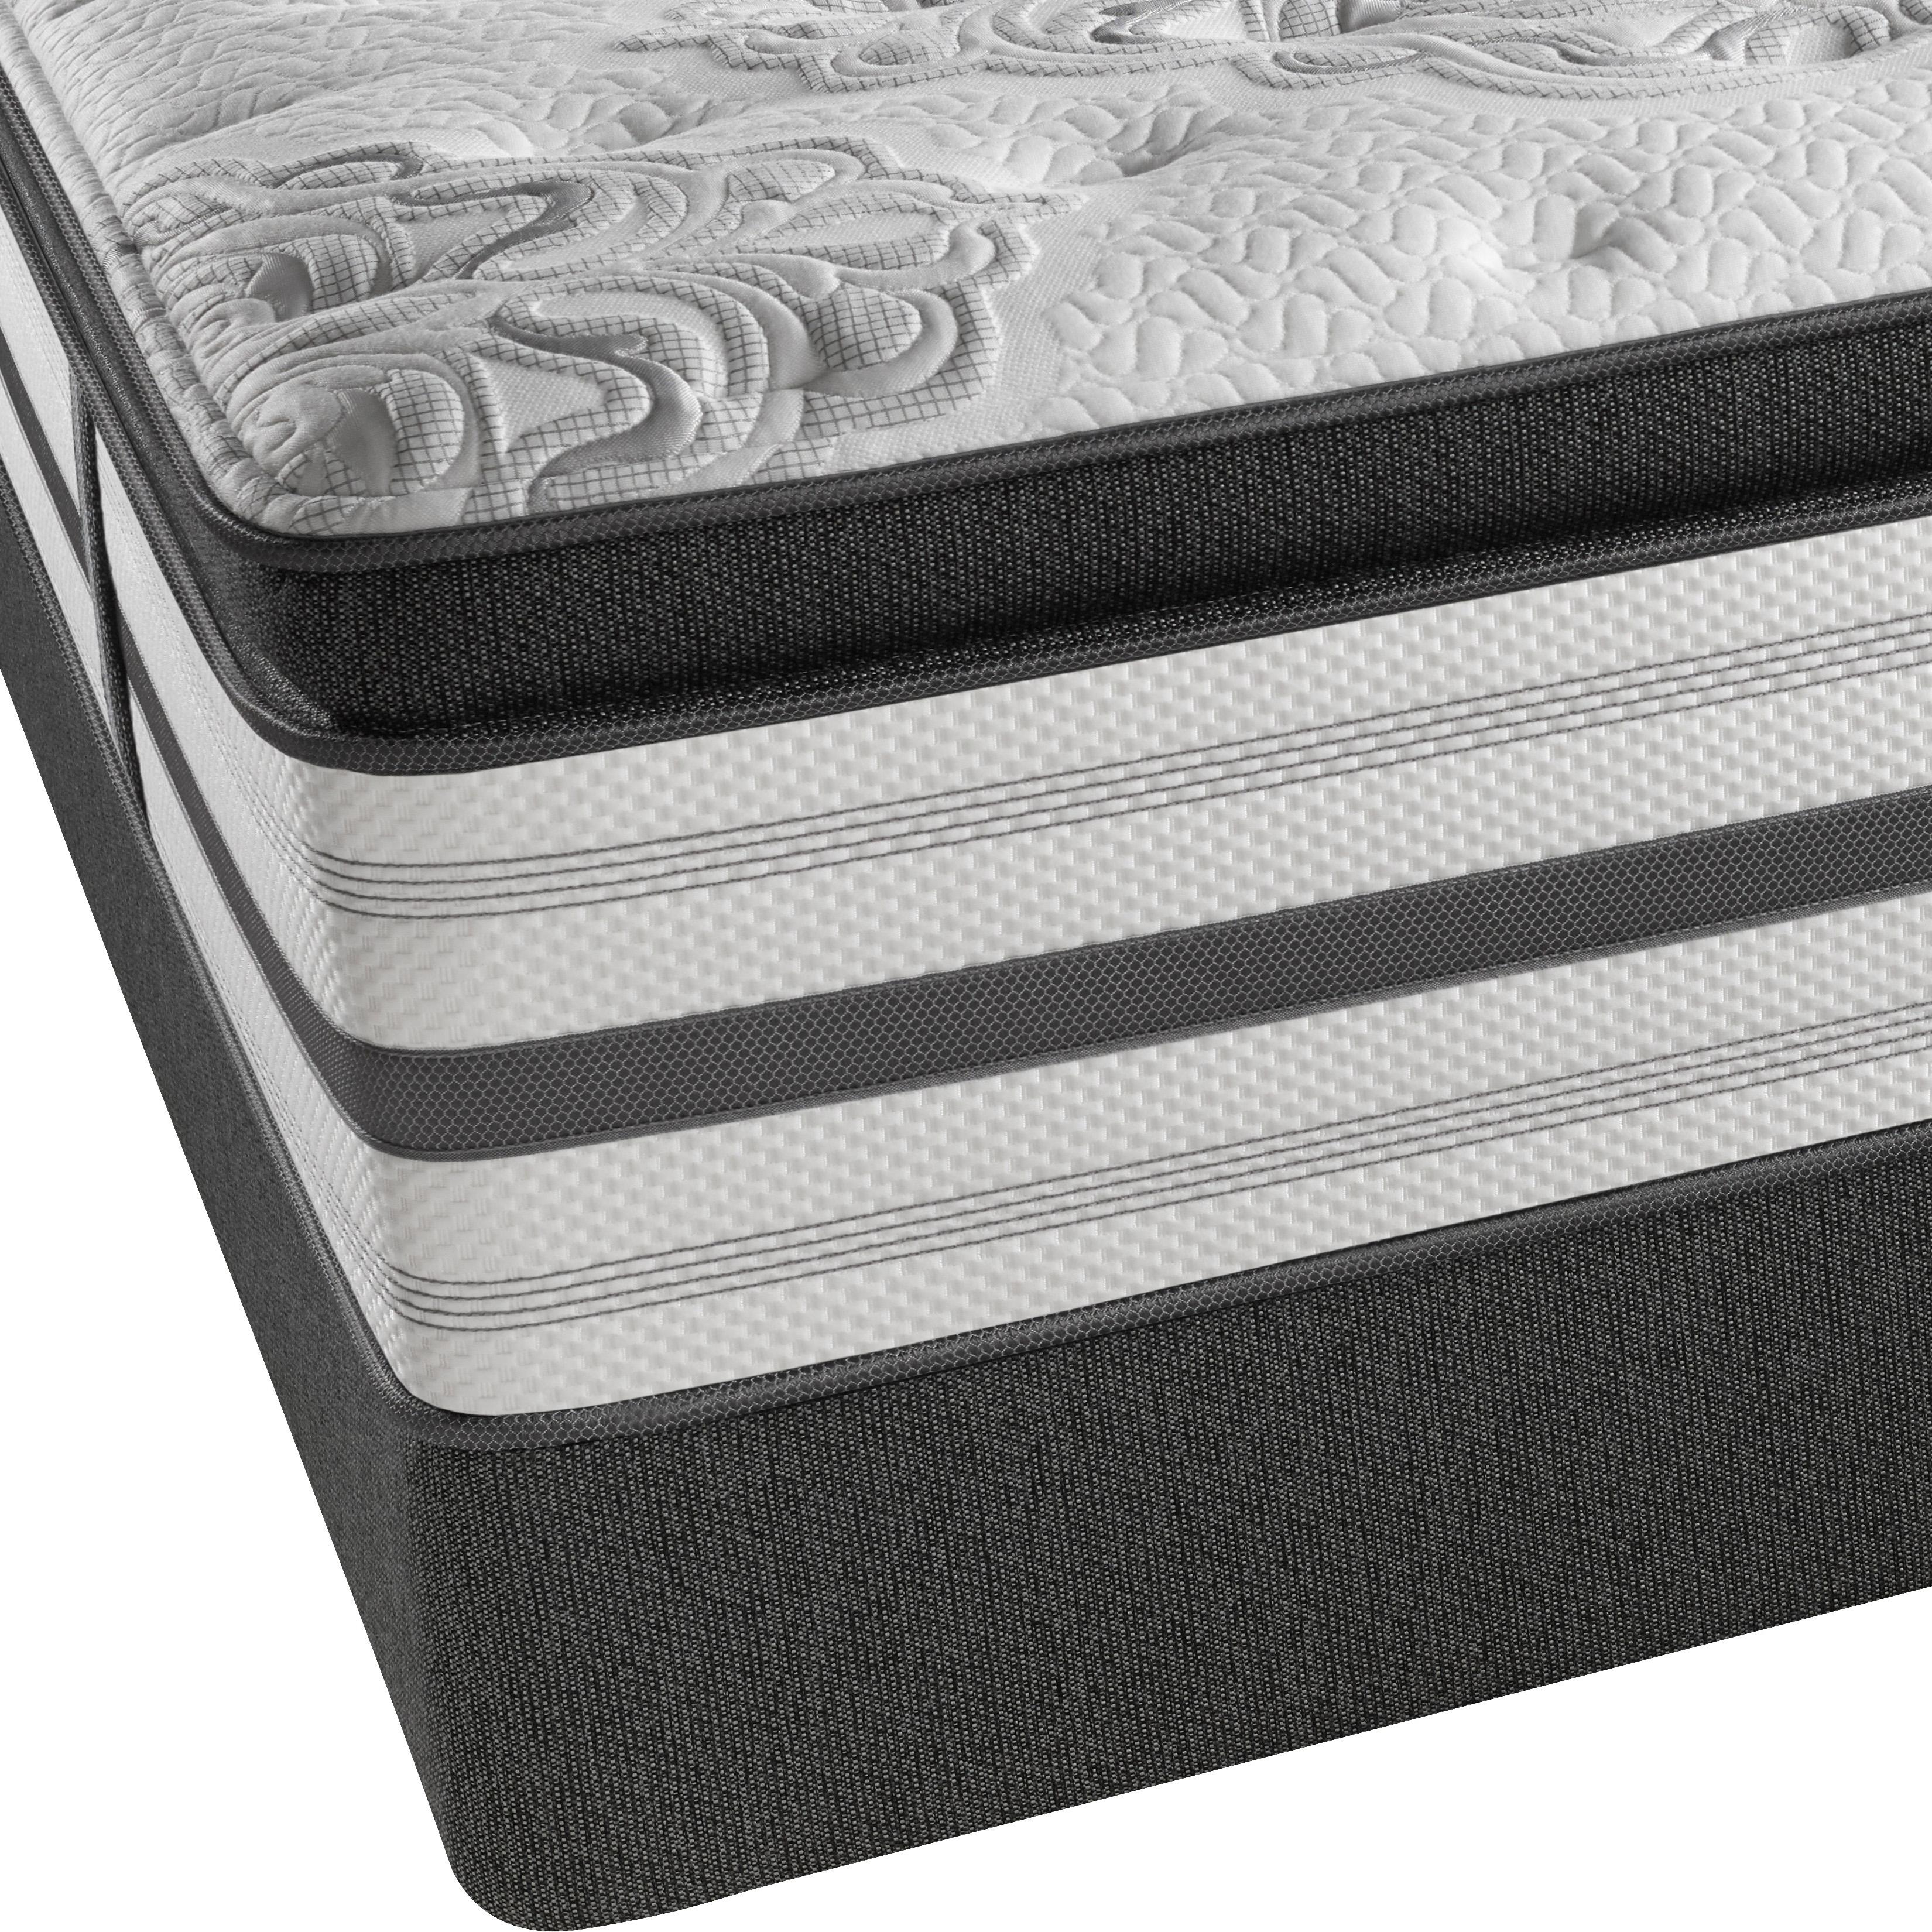 Simmons Beautyrest Platinum Westfield Luxury Firm Box Top